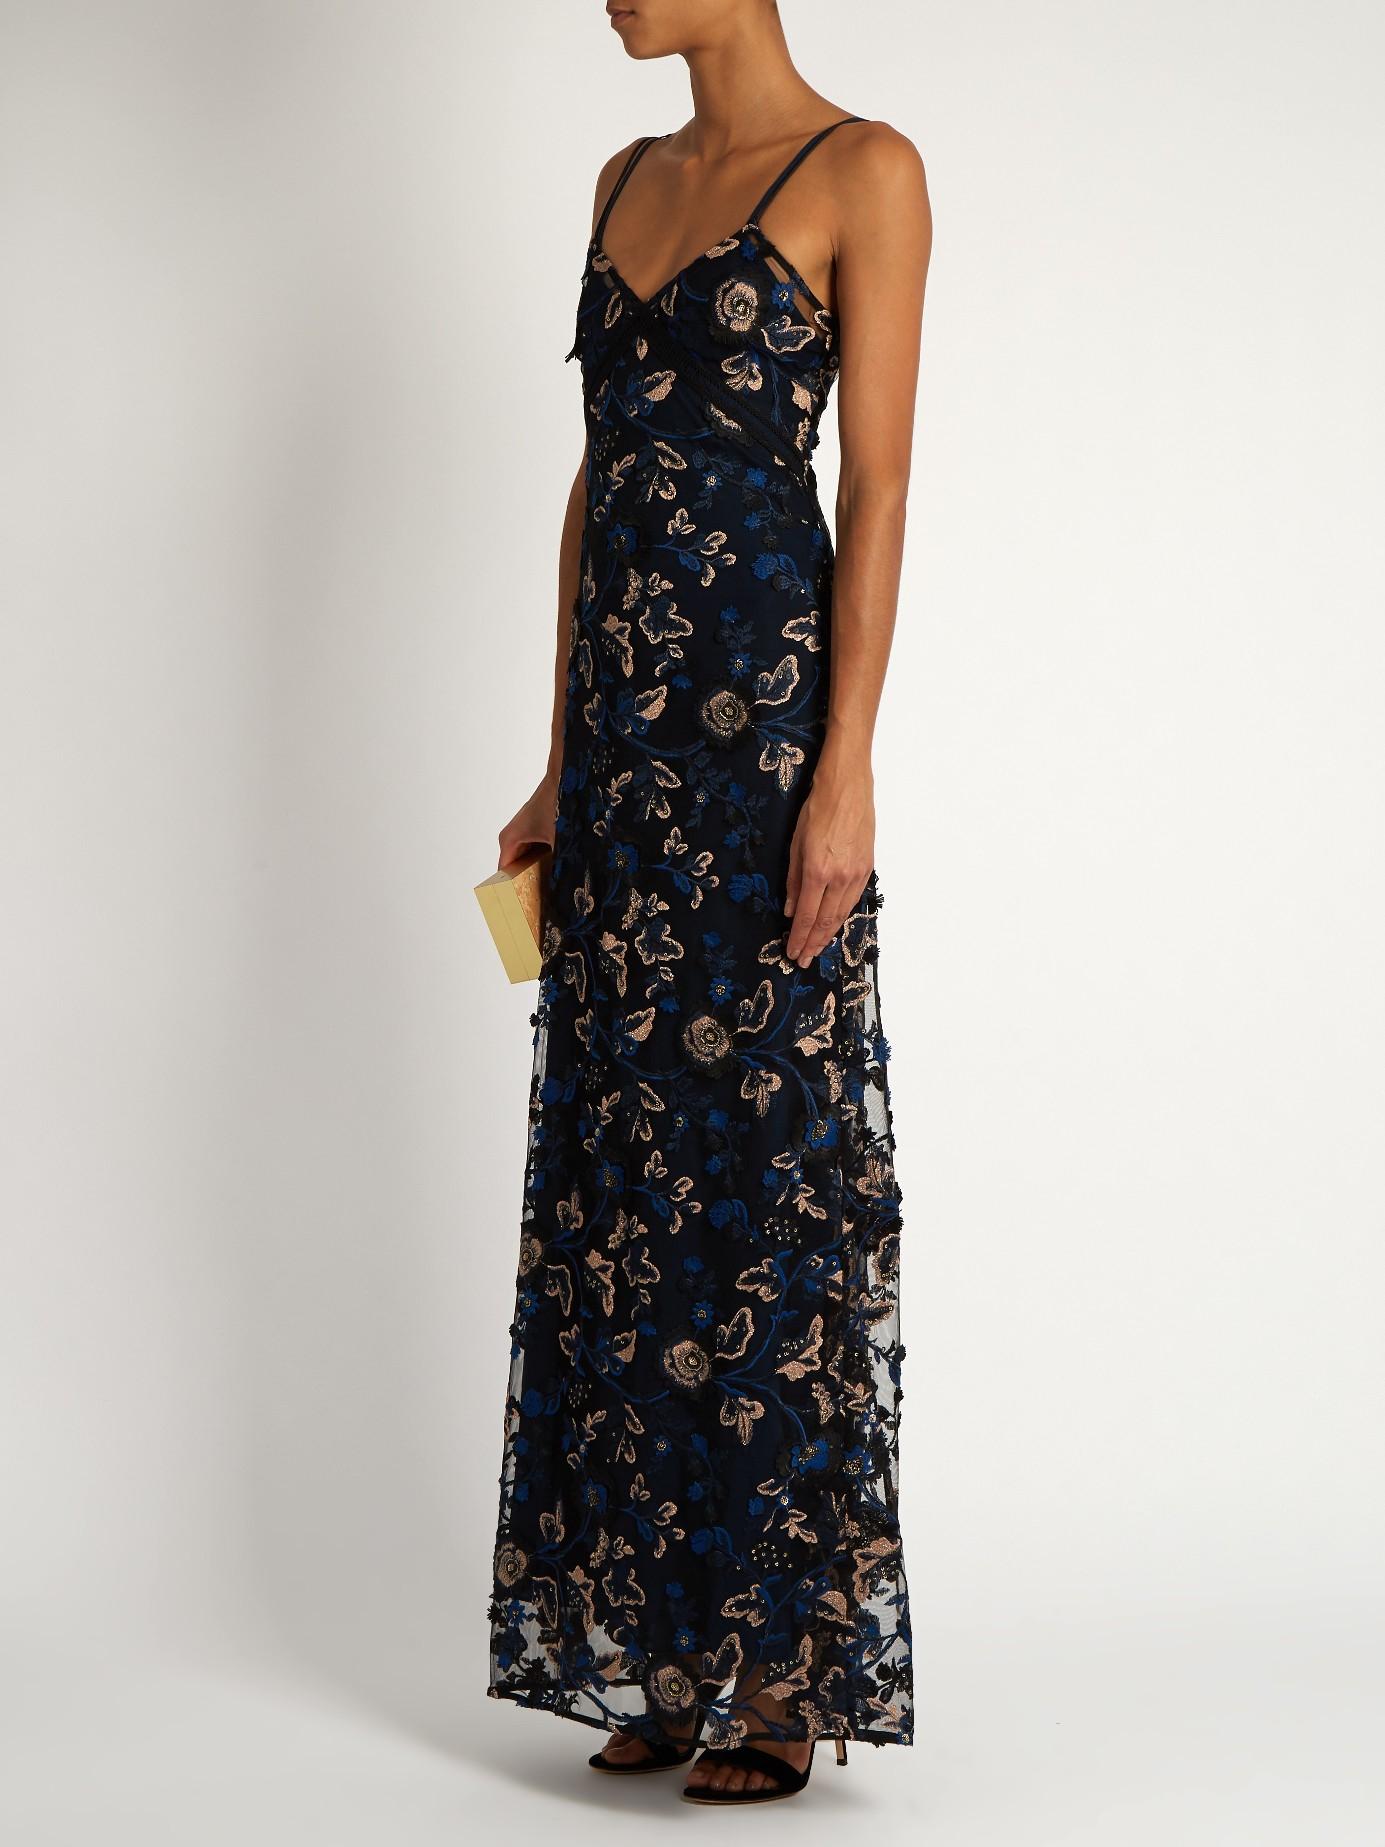 Embroidered Slip Dress